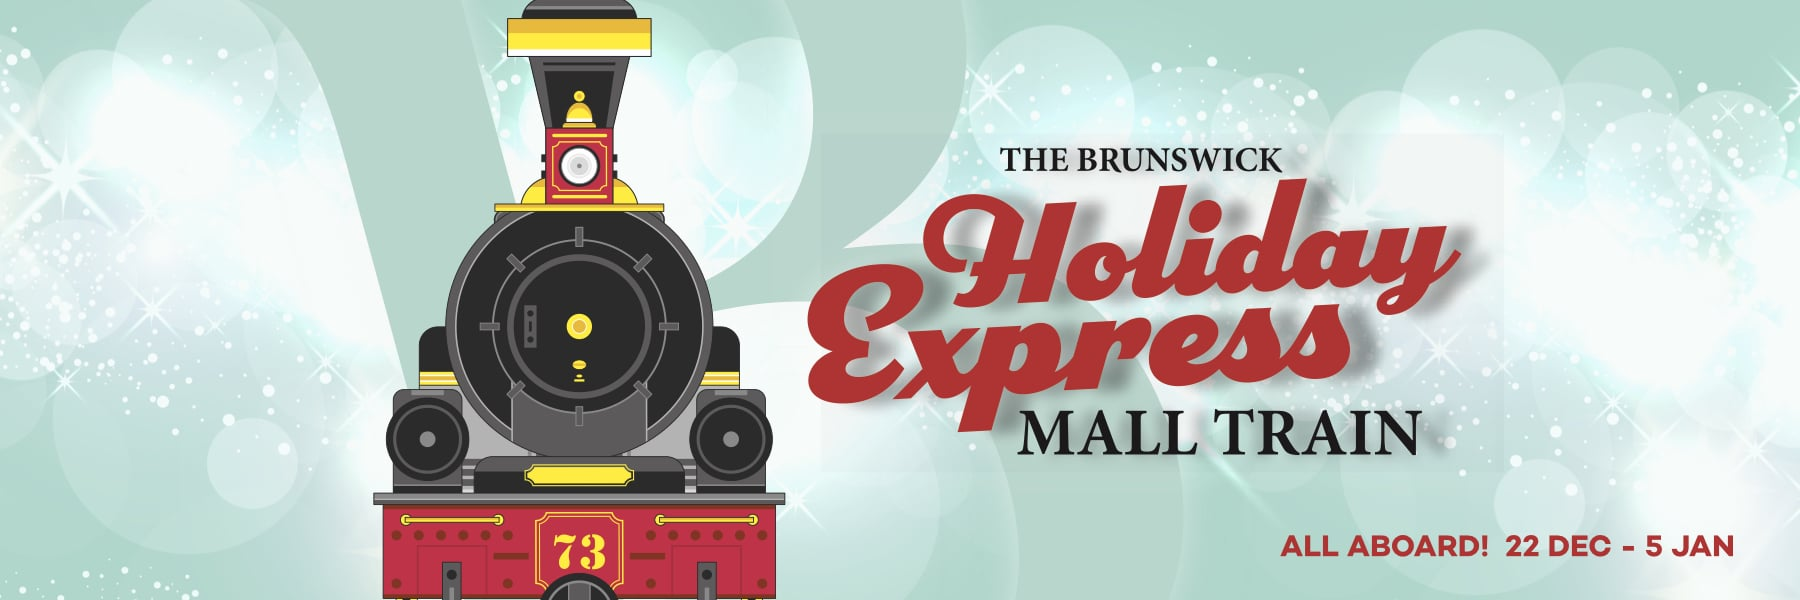 The Brunswick Holiday Express